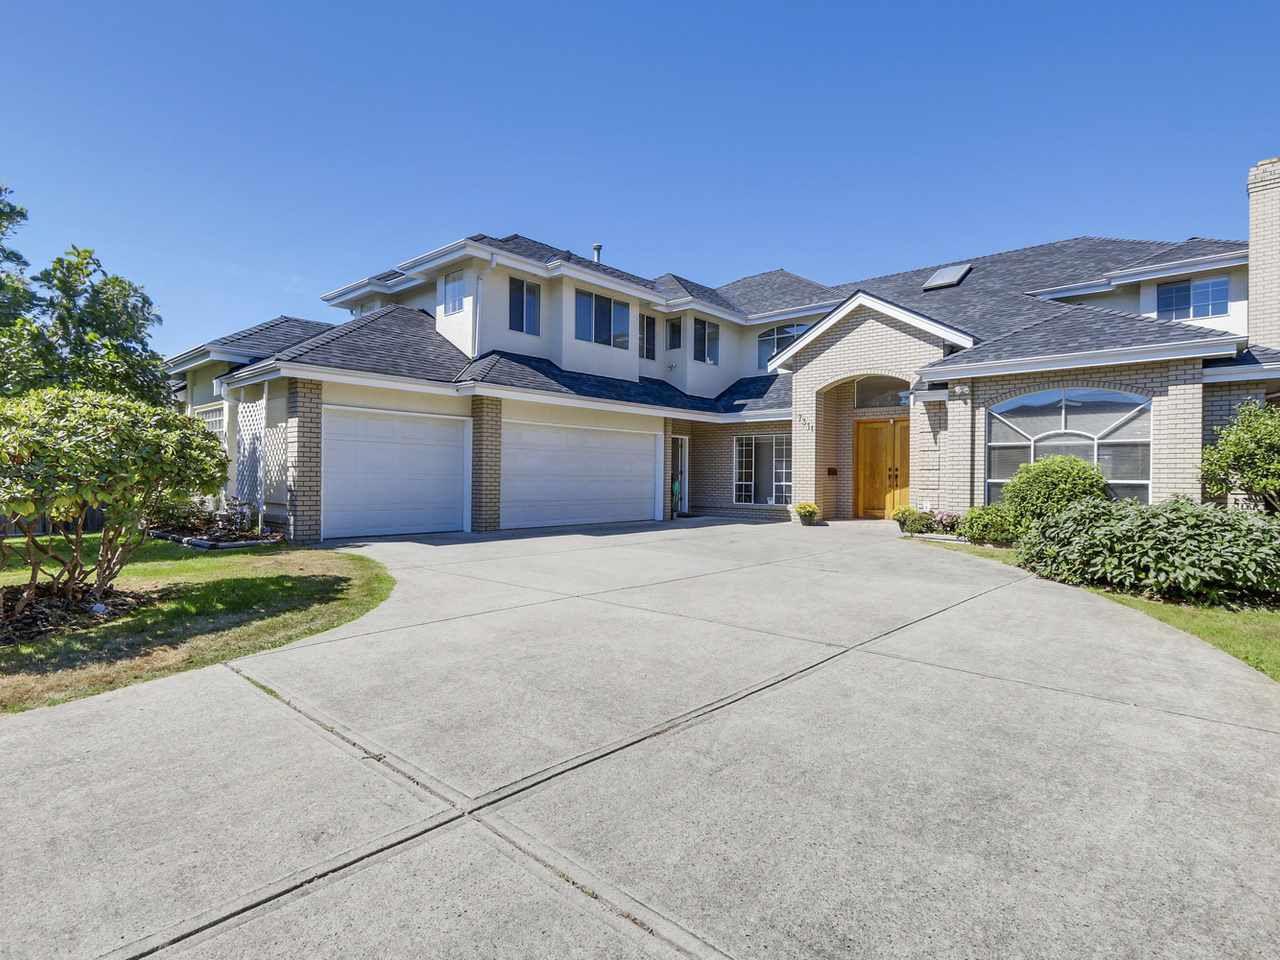 "Main Photo: 7311 BELAIR Drive in Richmond: Broadmoor House for sale in ""BROADMOOR"" : MLS®# R2102890"